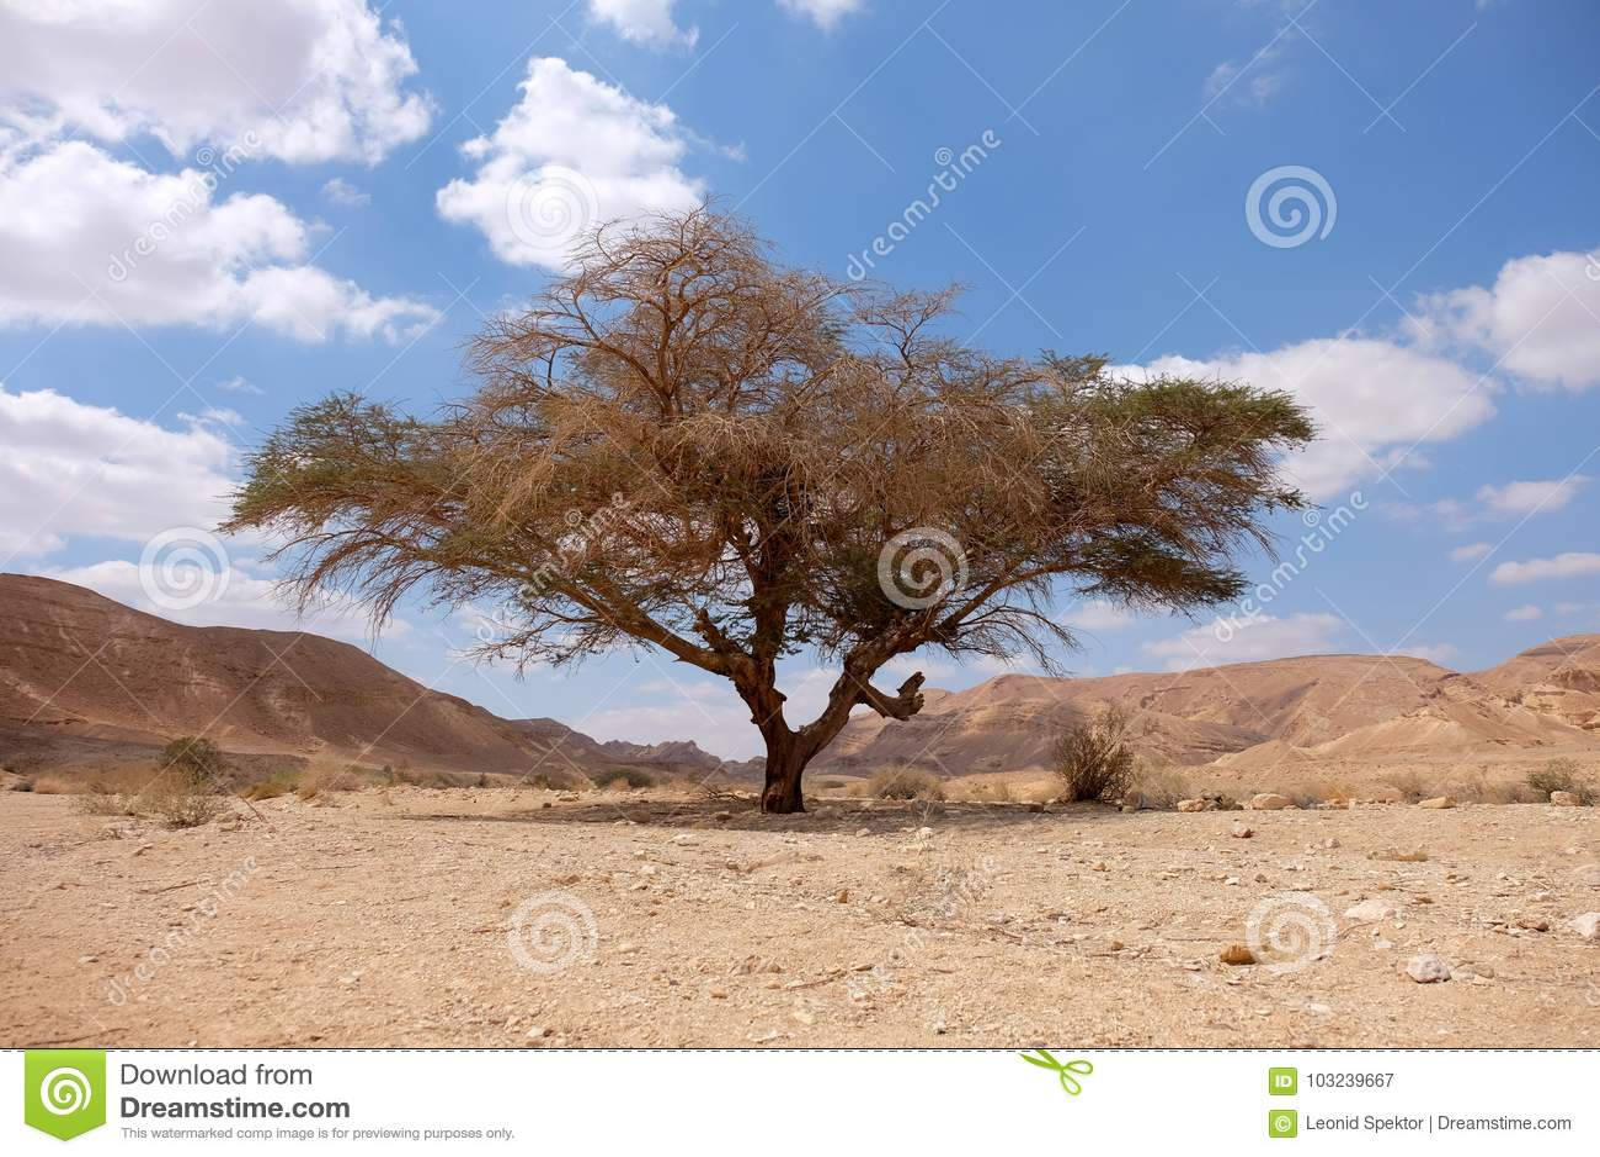 Neqev沙漠风景